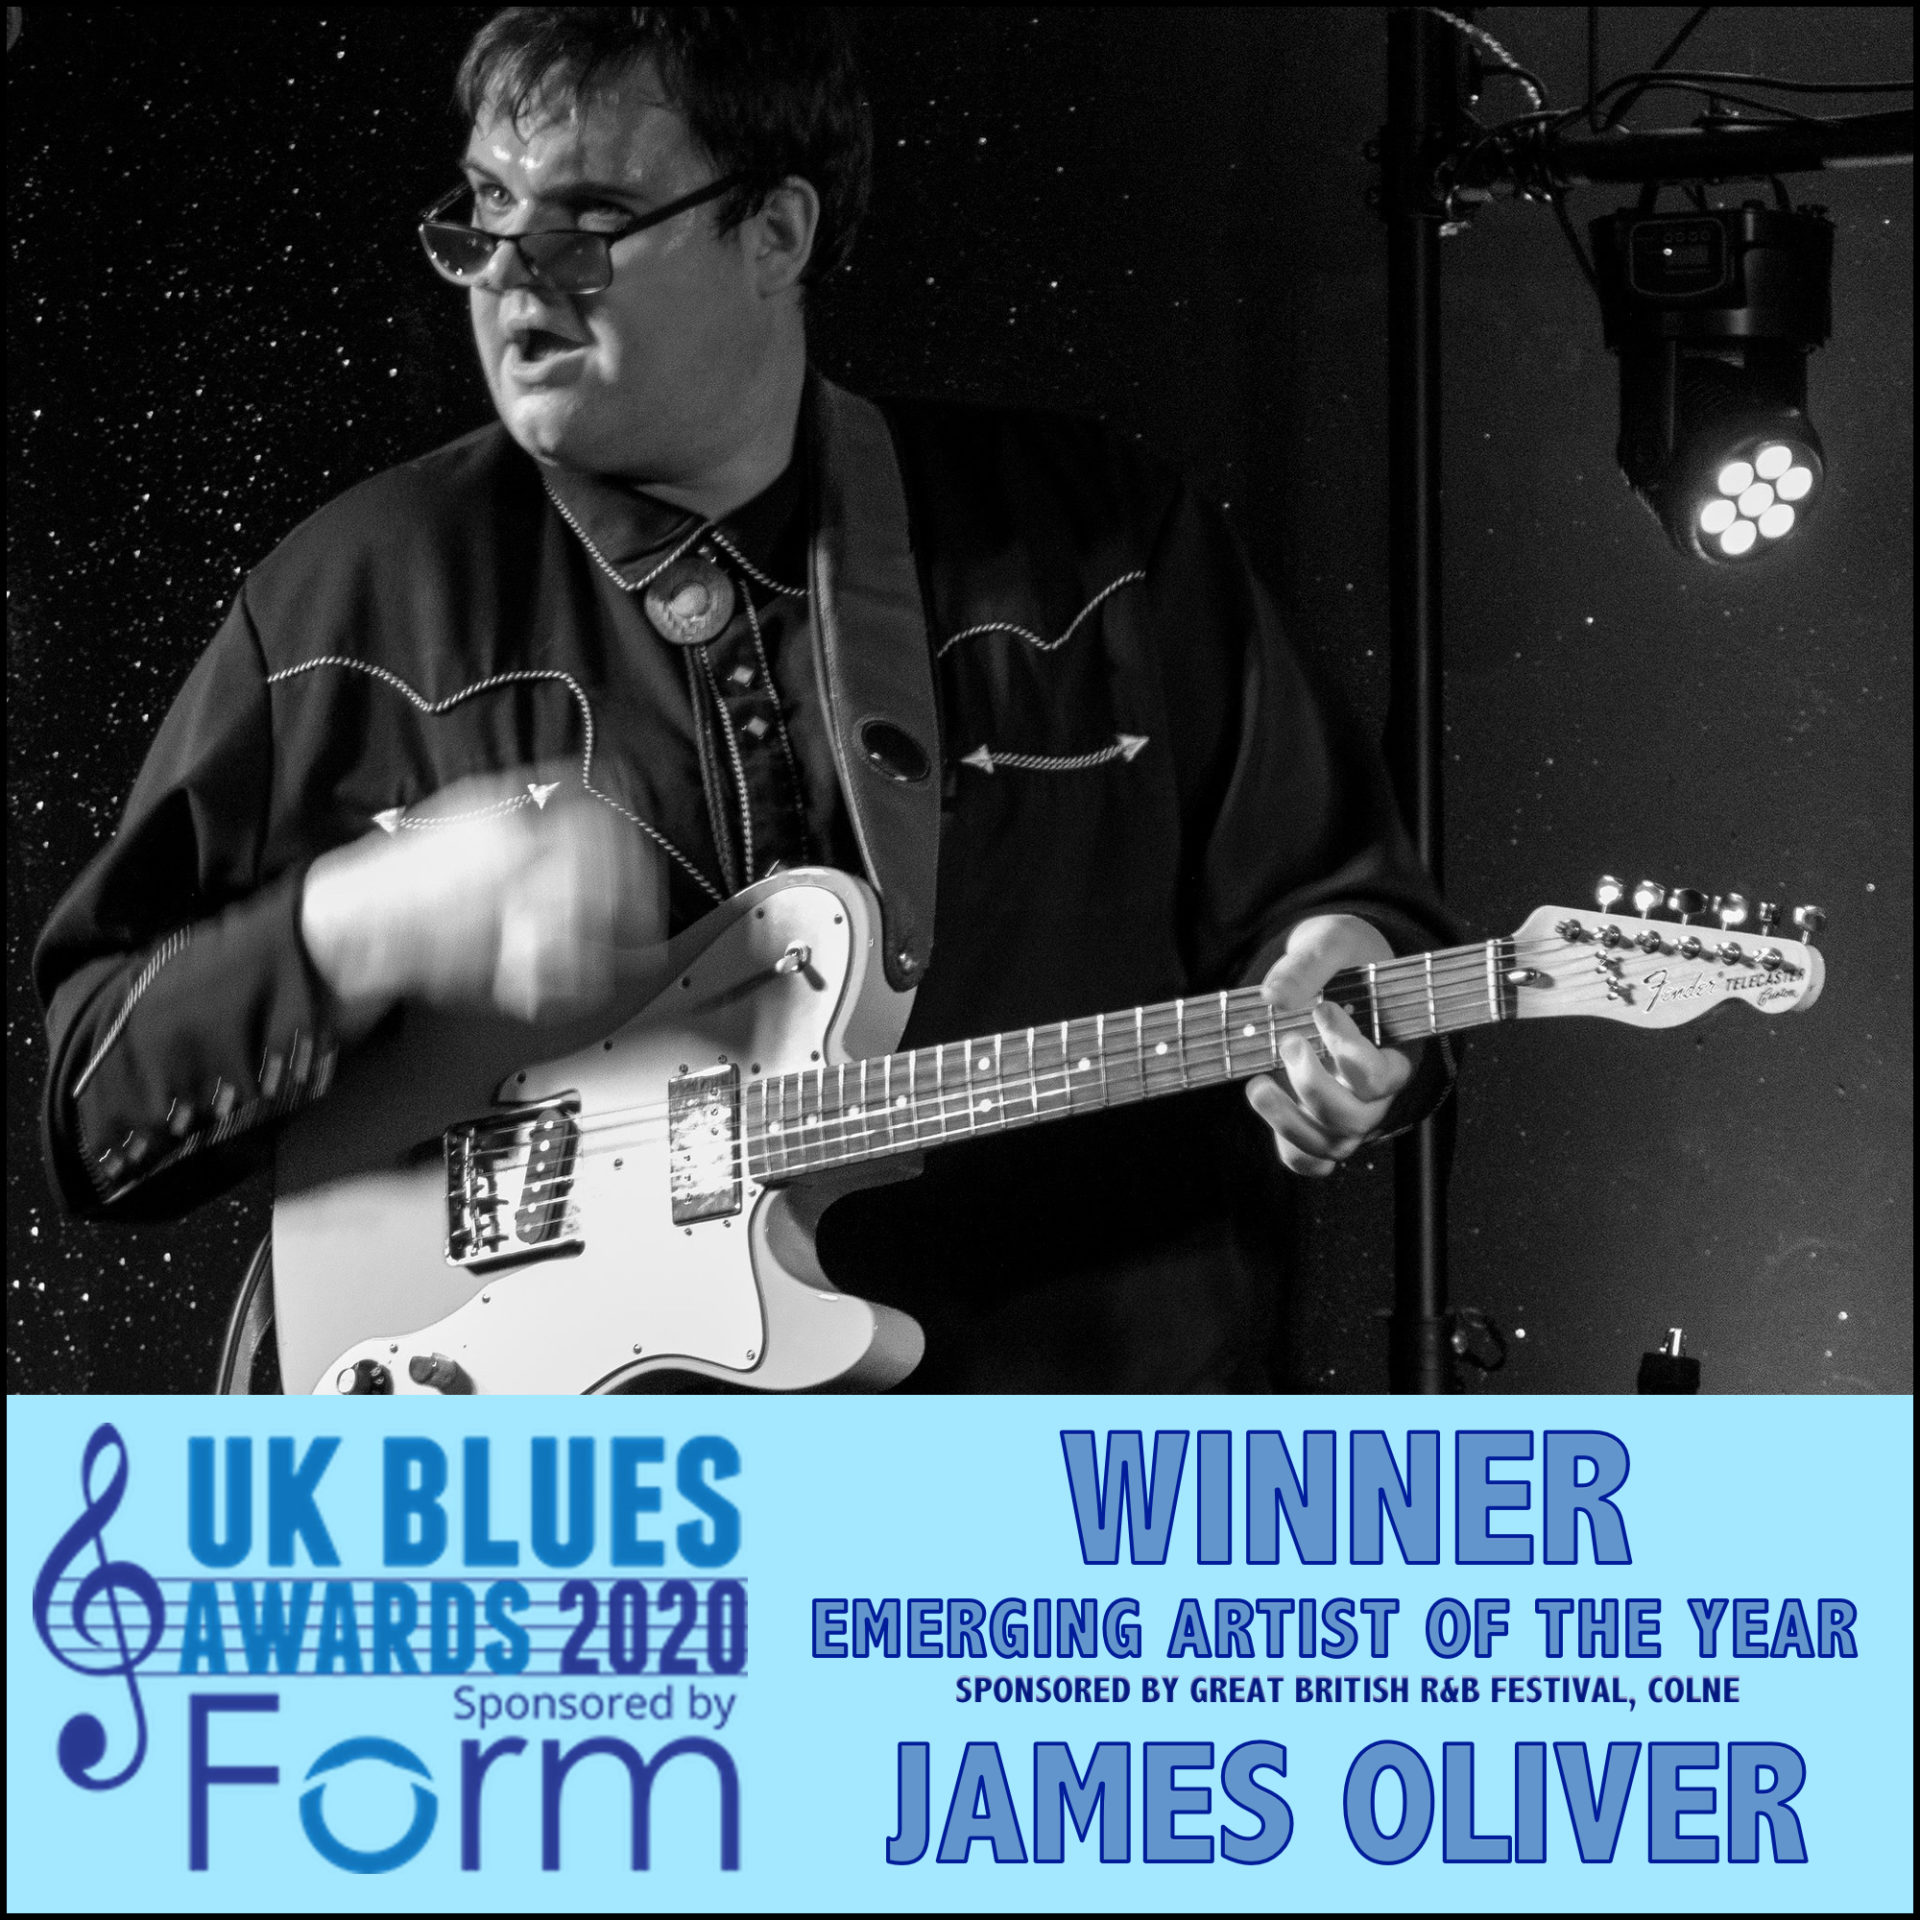 image of ukblues award winner james oliver